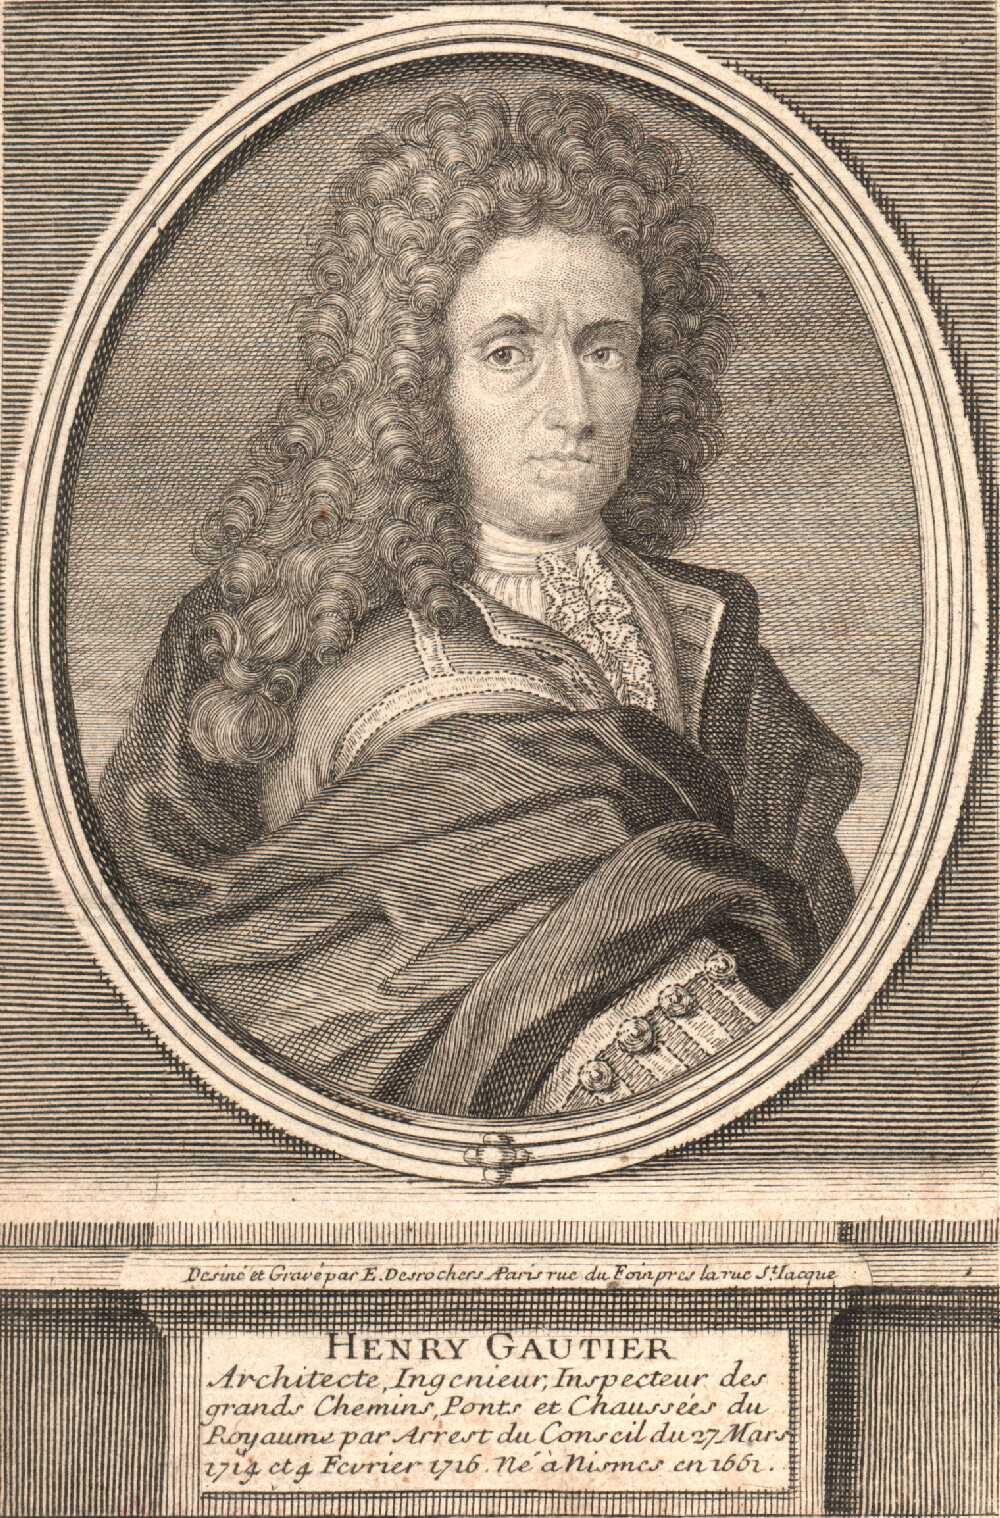 Portrait of Henri Gautier,  Image number:SIL14-G001-11a